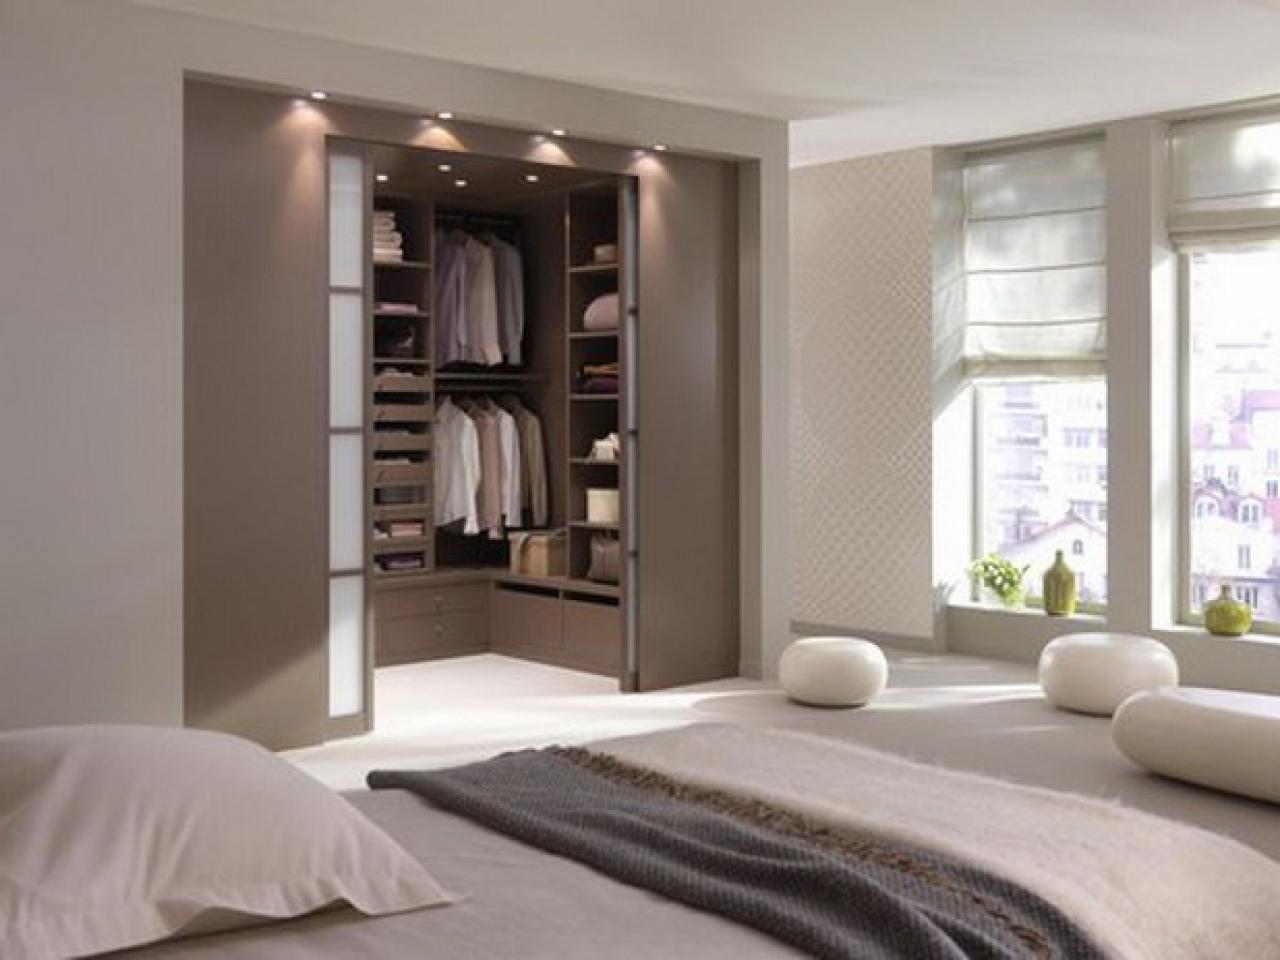 Шкафы в спальню фото внутри стен